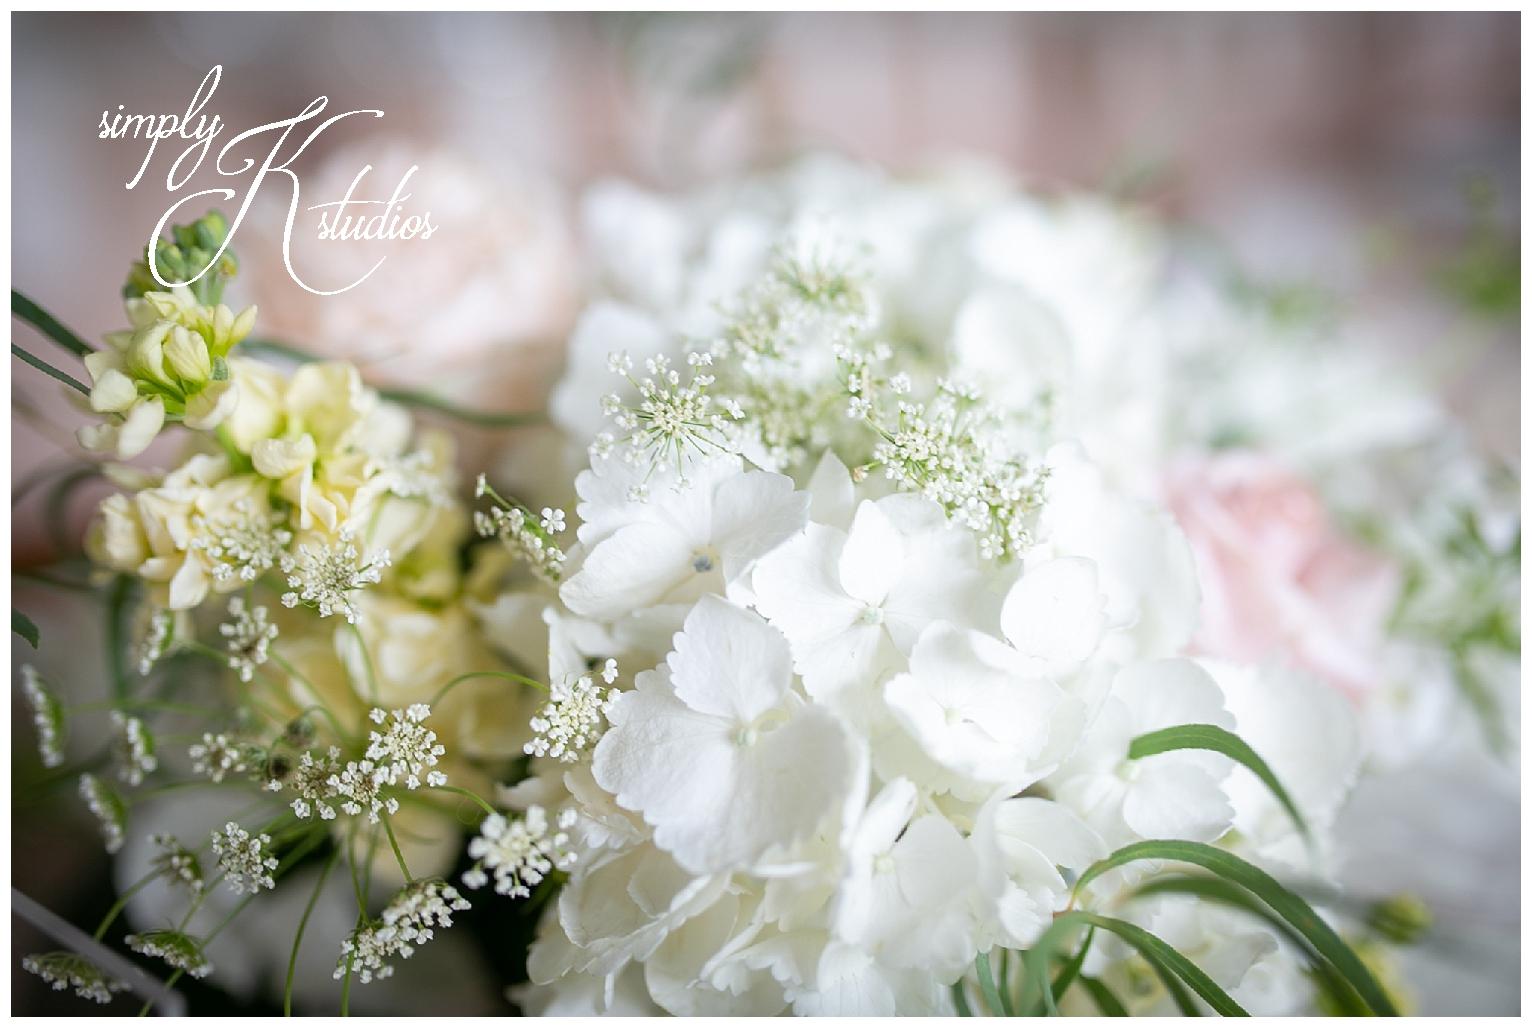 Summer Flowers for a Wedding.jpg